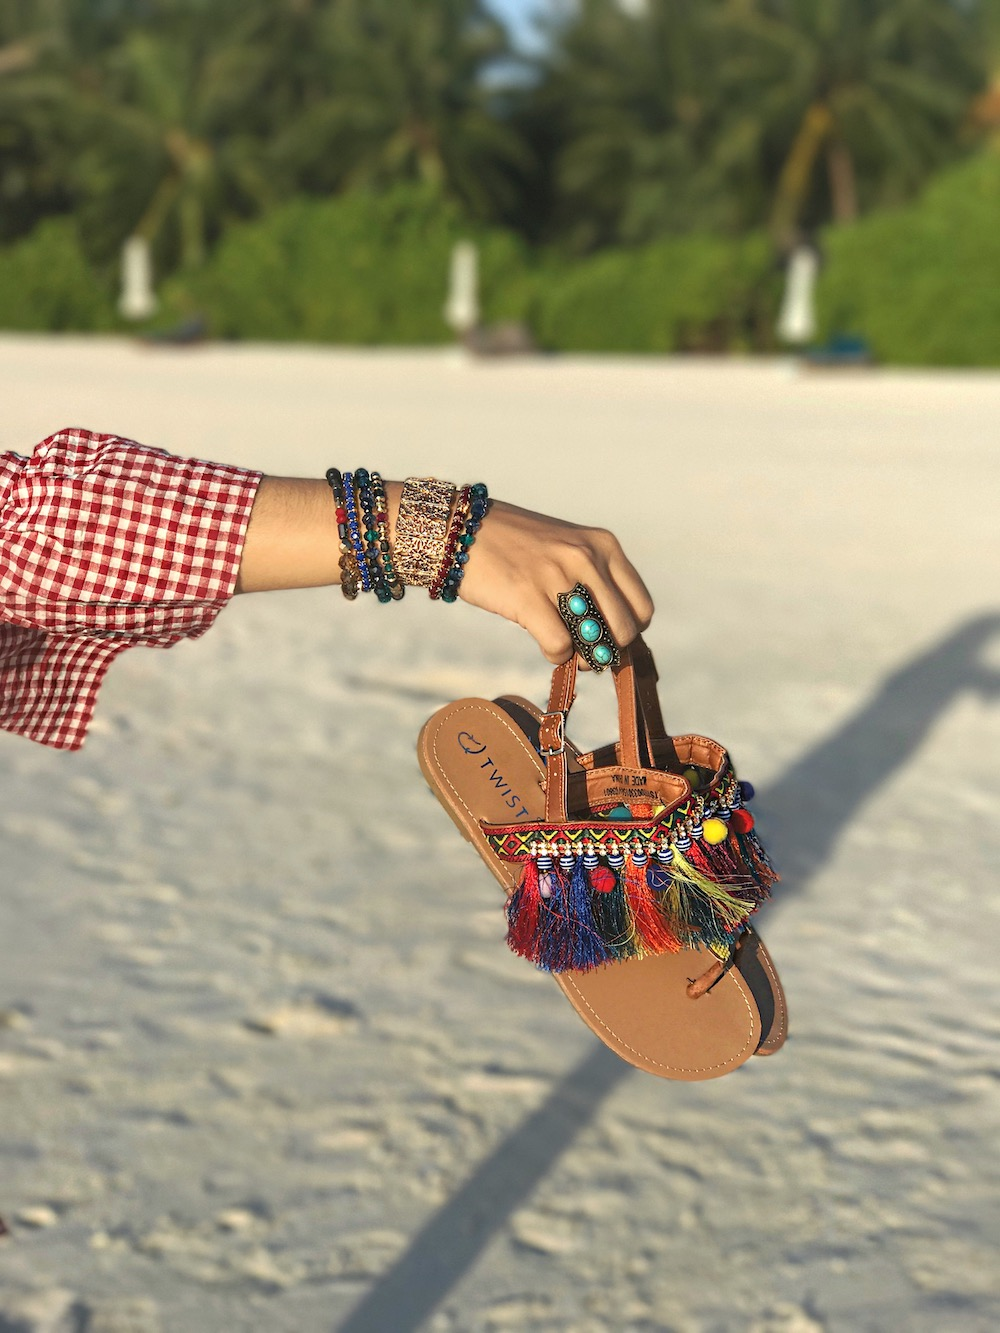 2017-summer-tassel-and-pom-pom-sandals-alley-girl-fashion-travel-life-style-blog